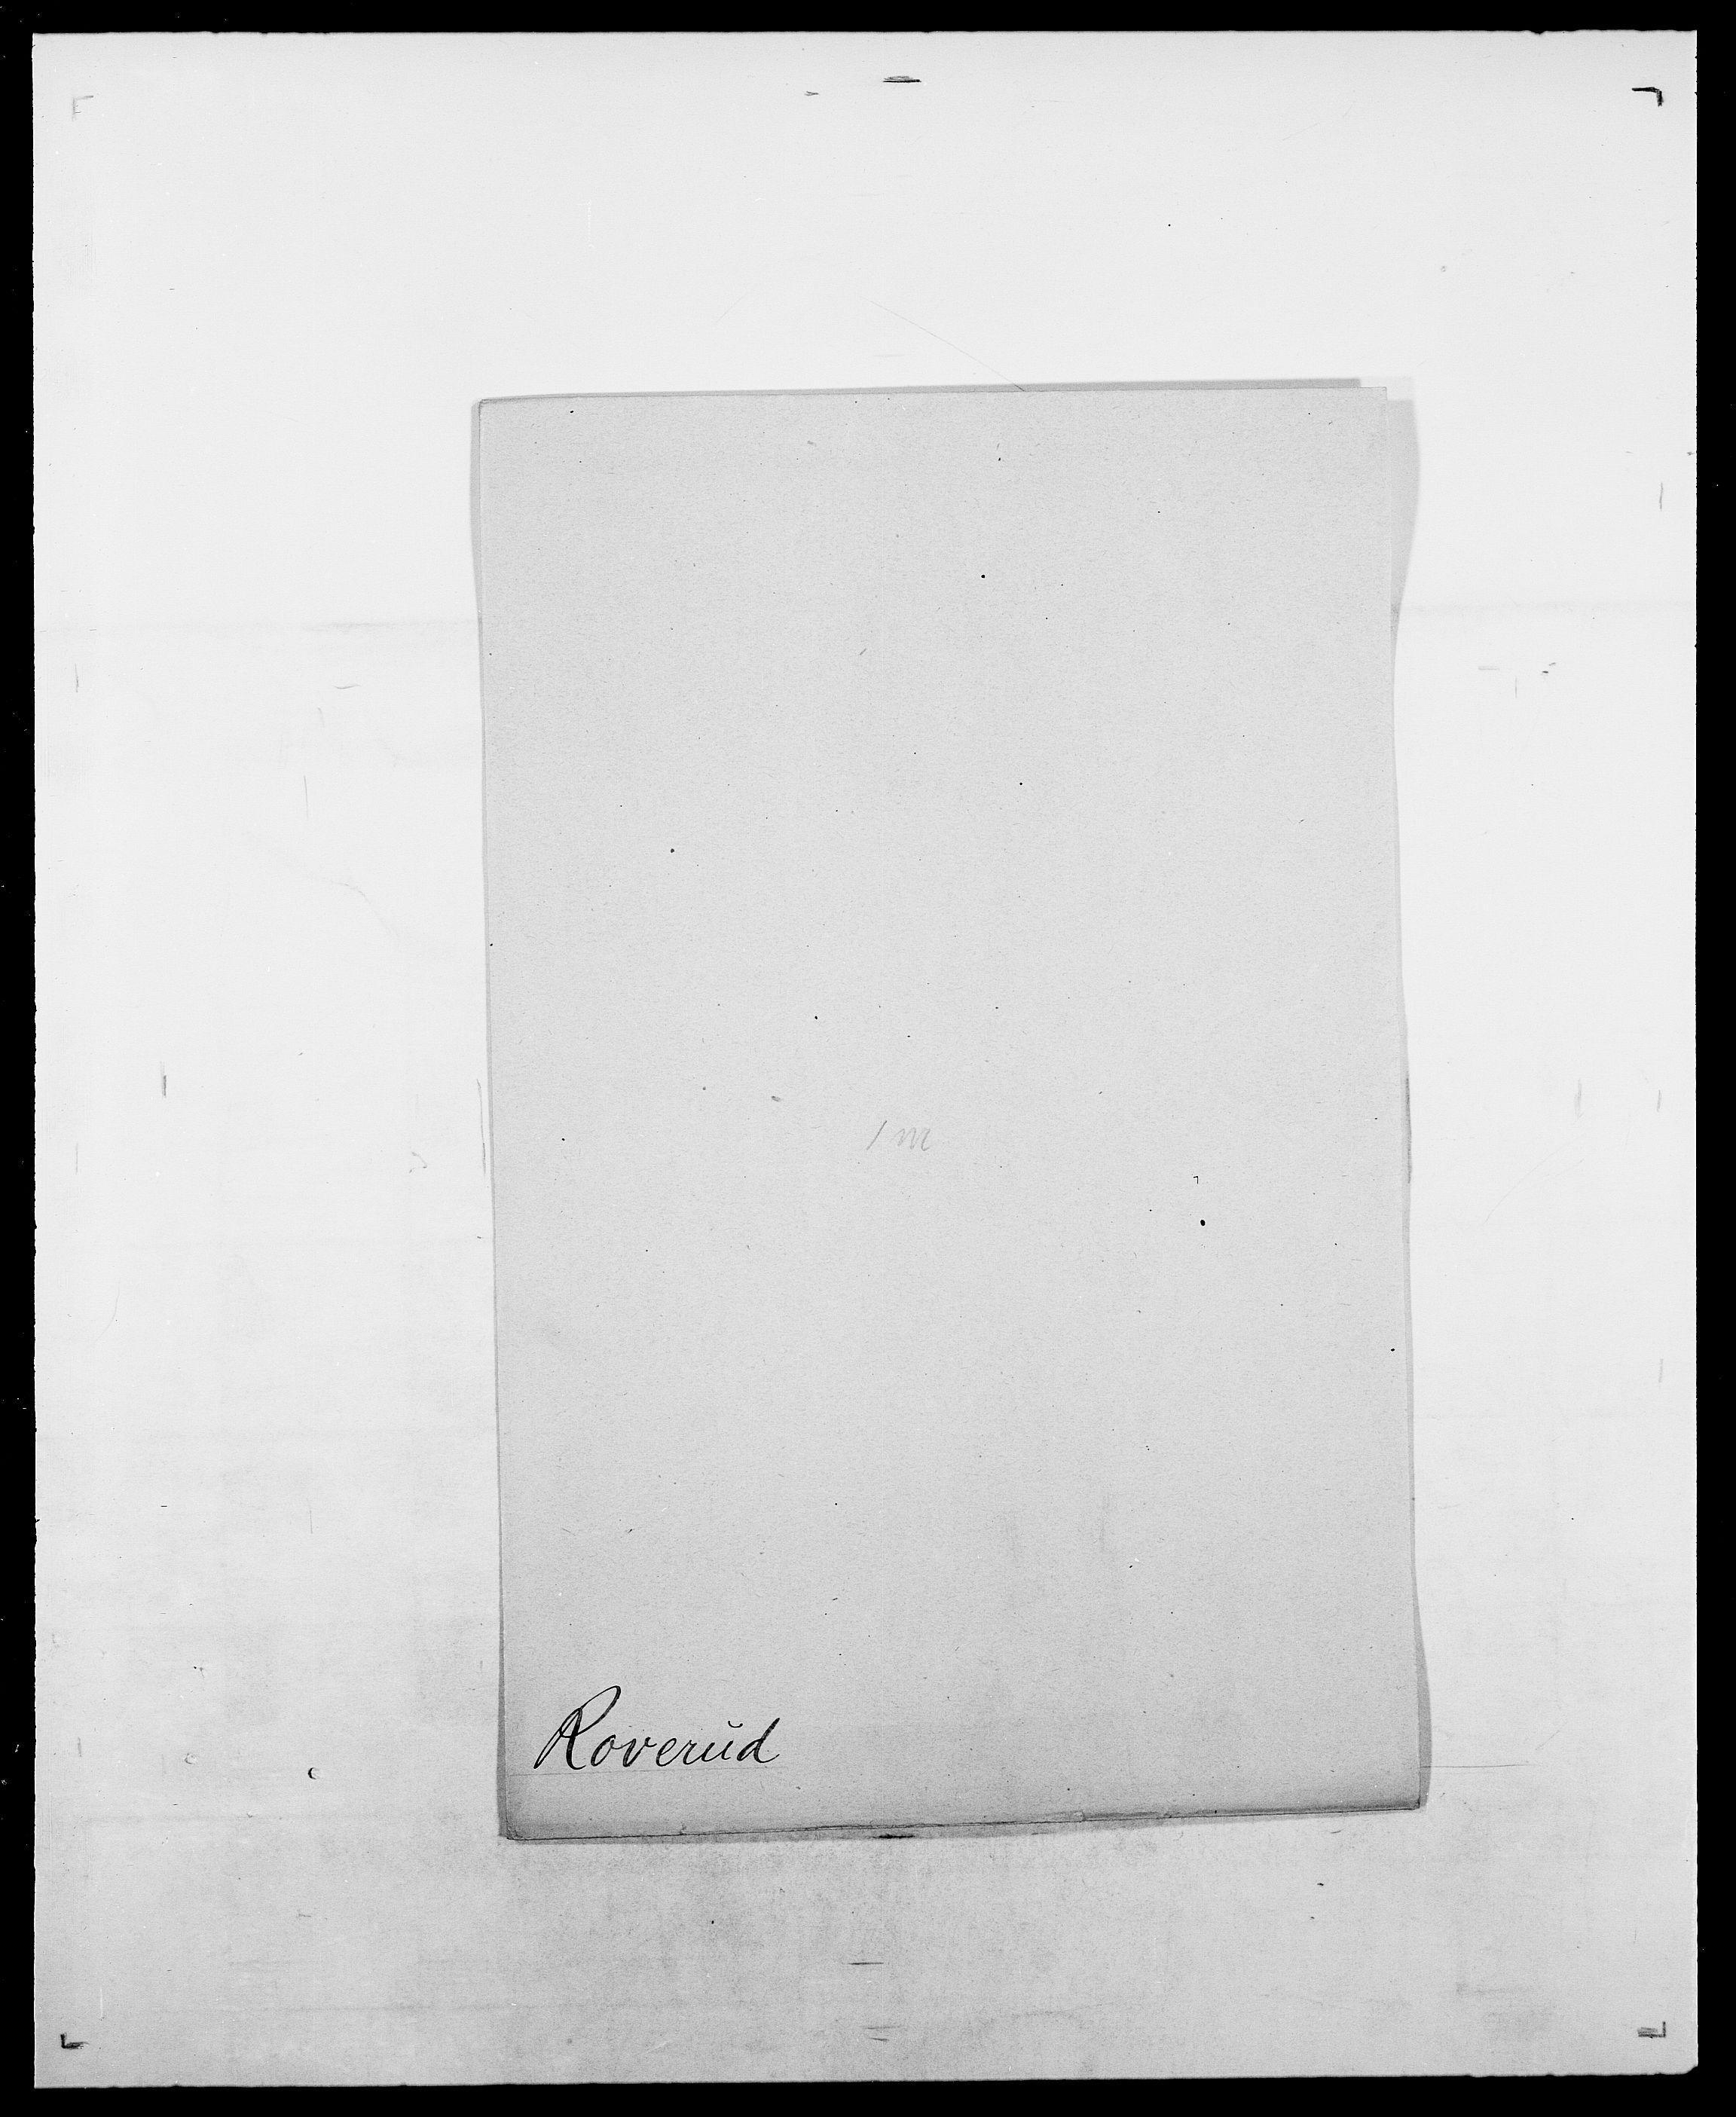 SAO, Delgobe, Charles Antoine - samling, D/Da/L0033: Roald - Røyem, s. 409